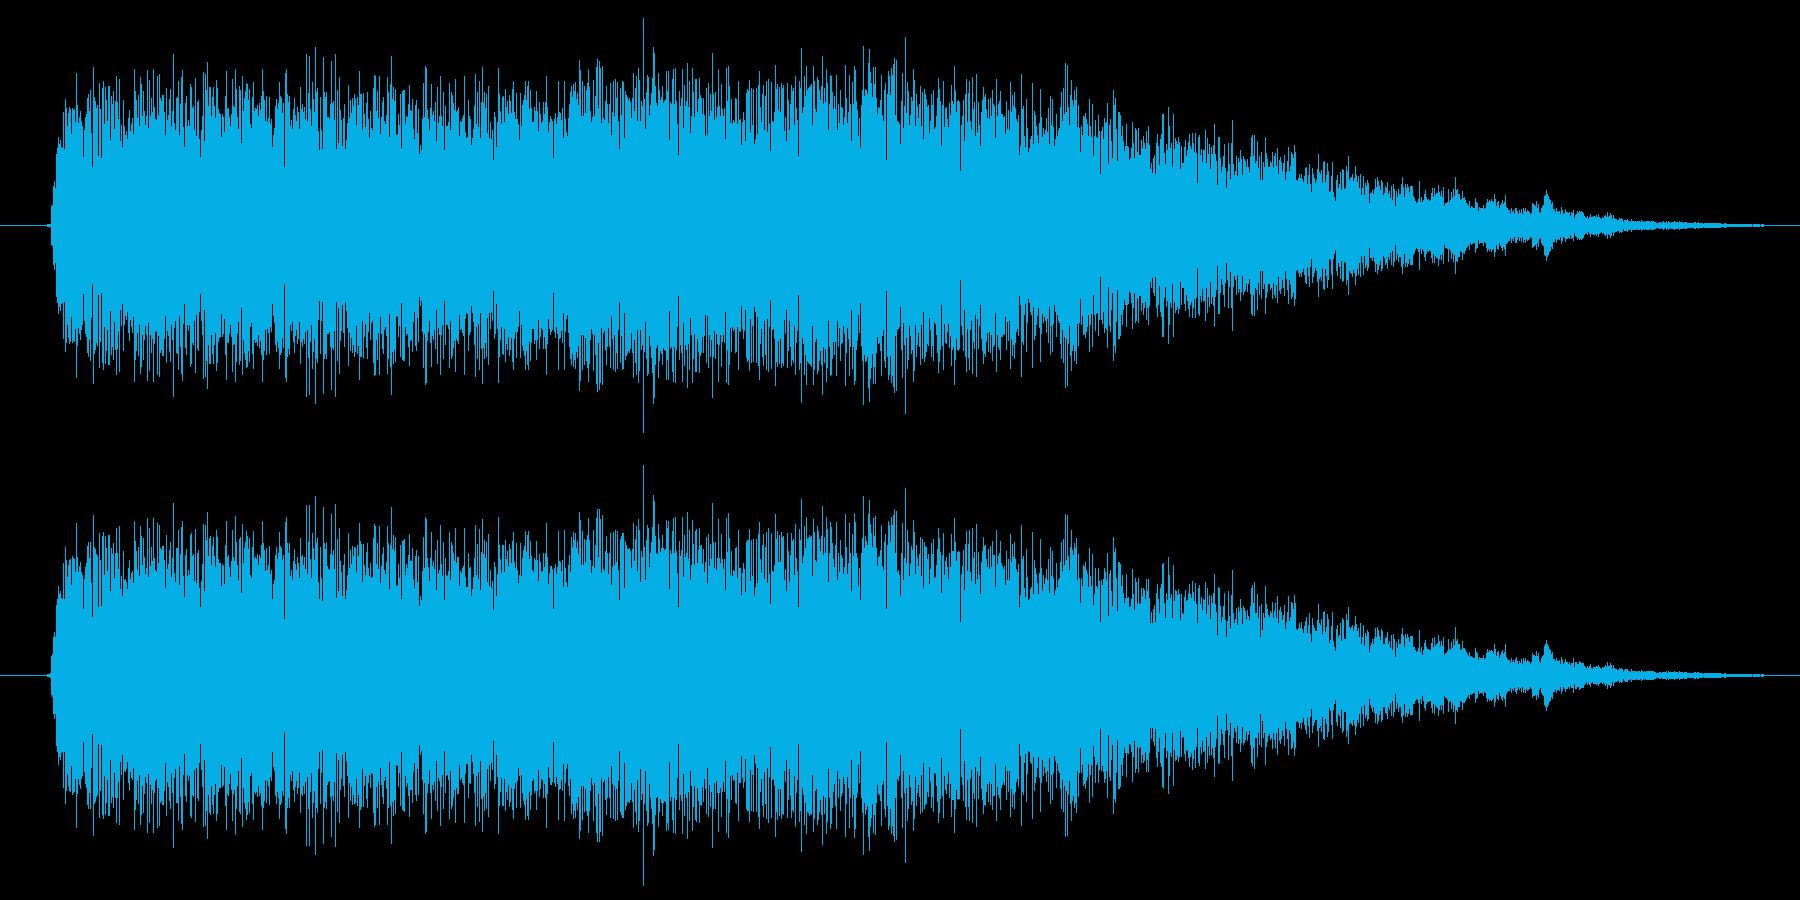 RPGの戦闘突入音の再生済みの波形